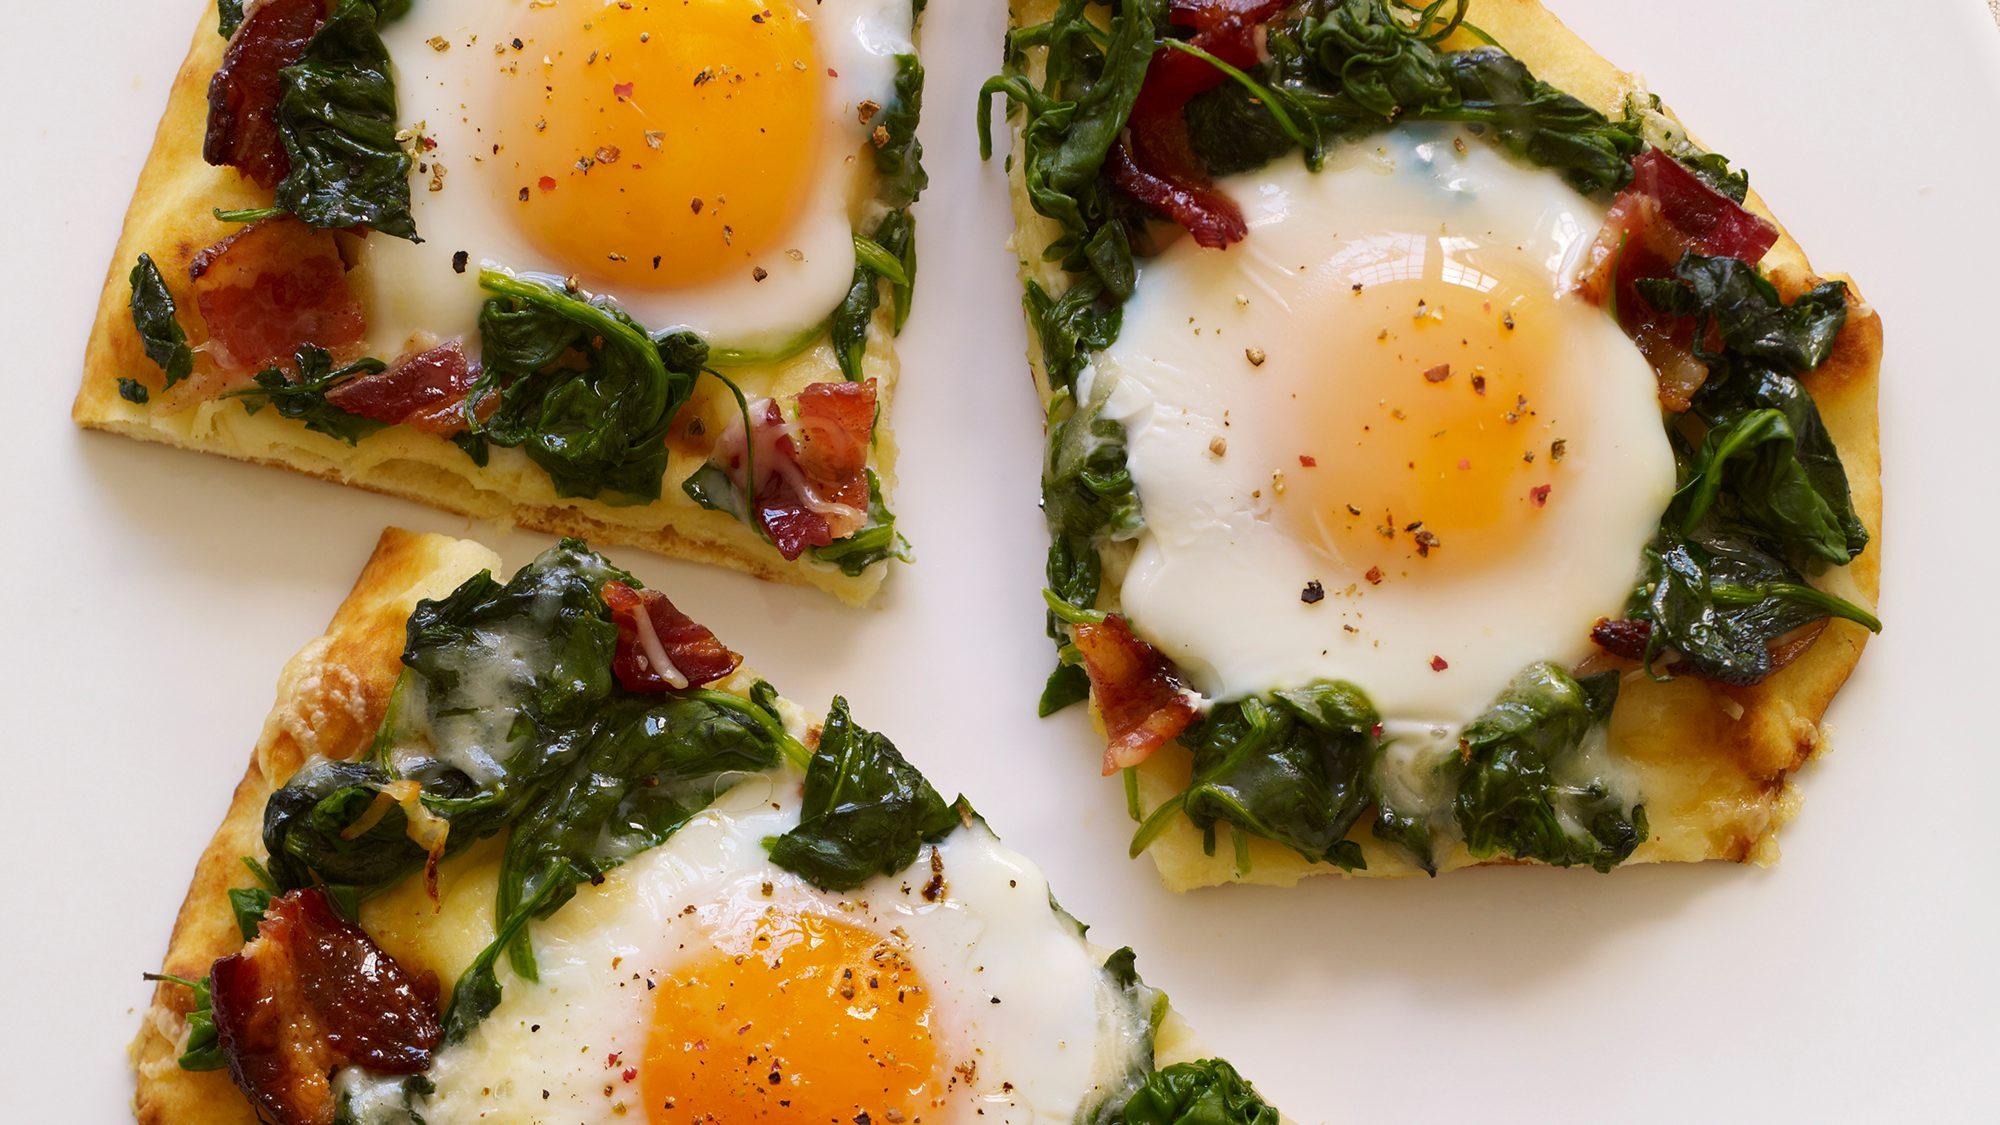 applewood-bacon-and-eggs-breakfast-flatbread (1).jpg